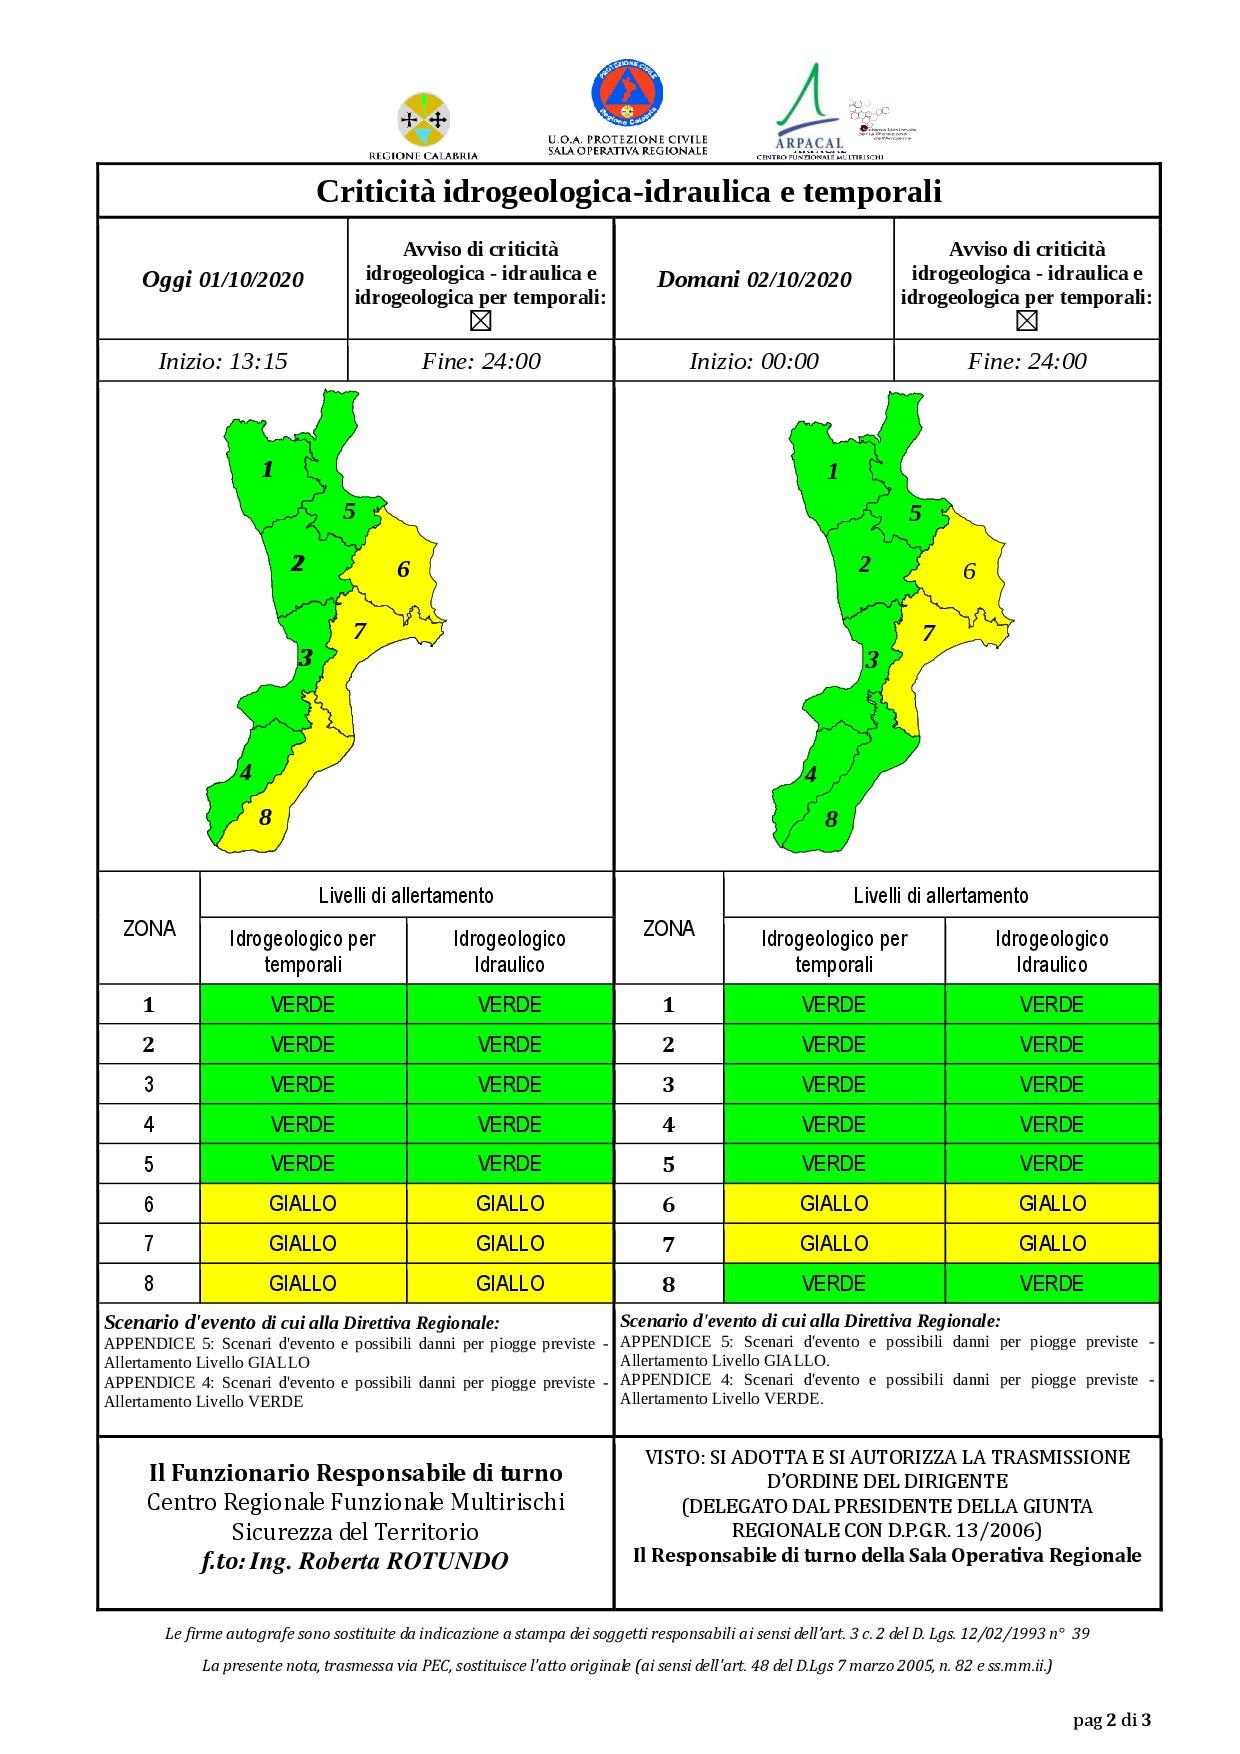 Criticità idrogeologica-idraulica e temporali in Calabria 01-10-2020